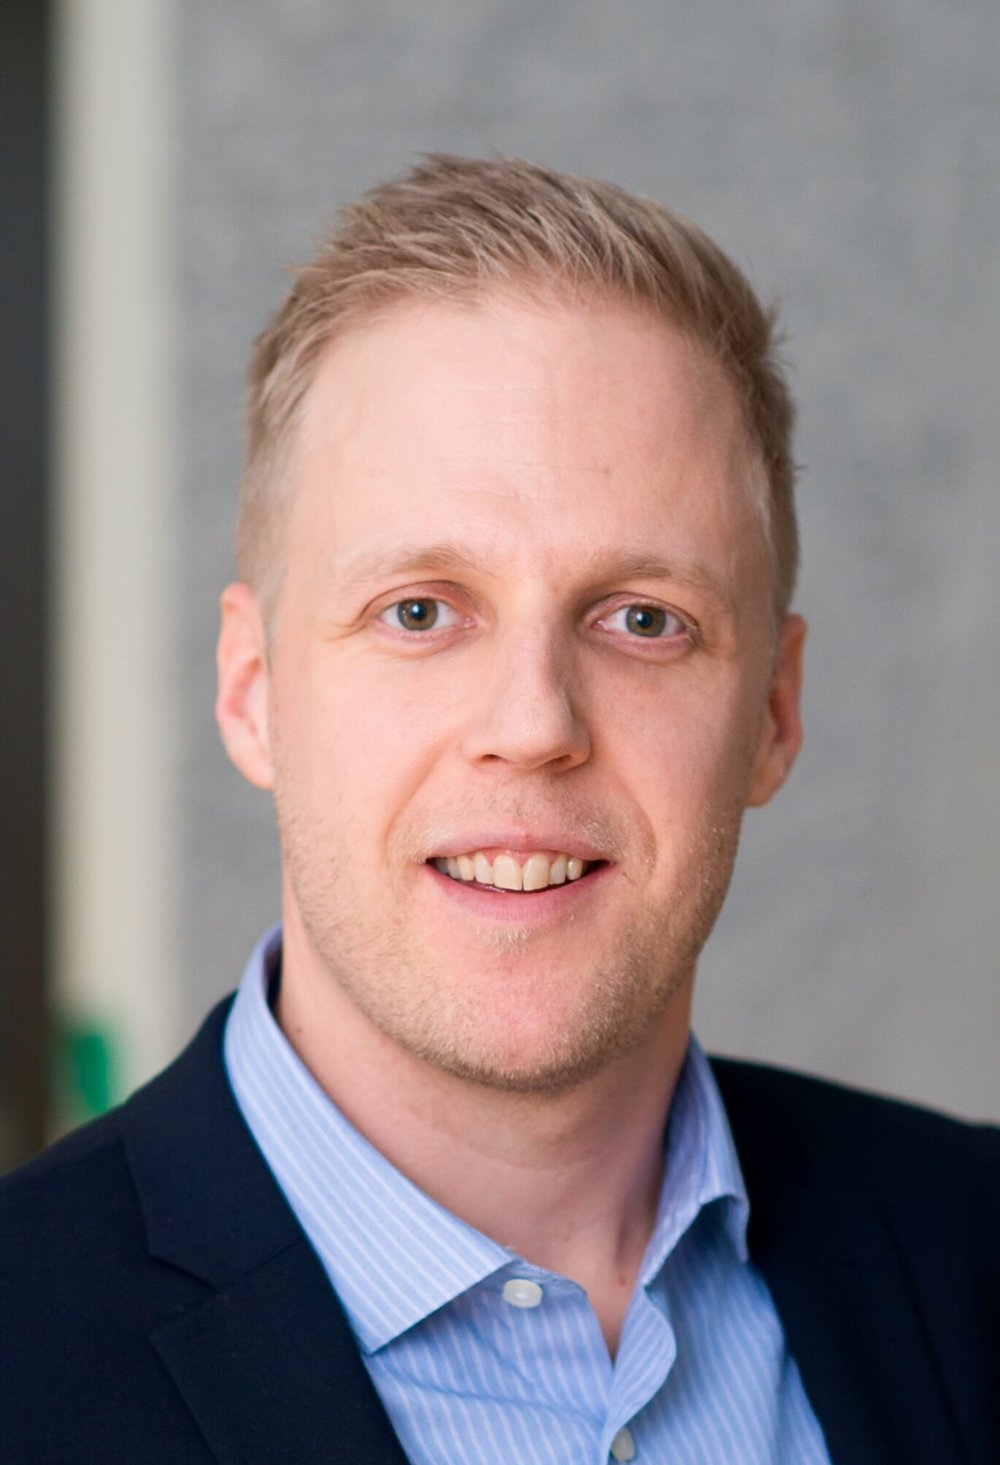 Kristian Hiljander - Member of Porokello steering group